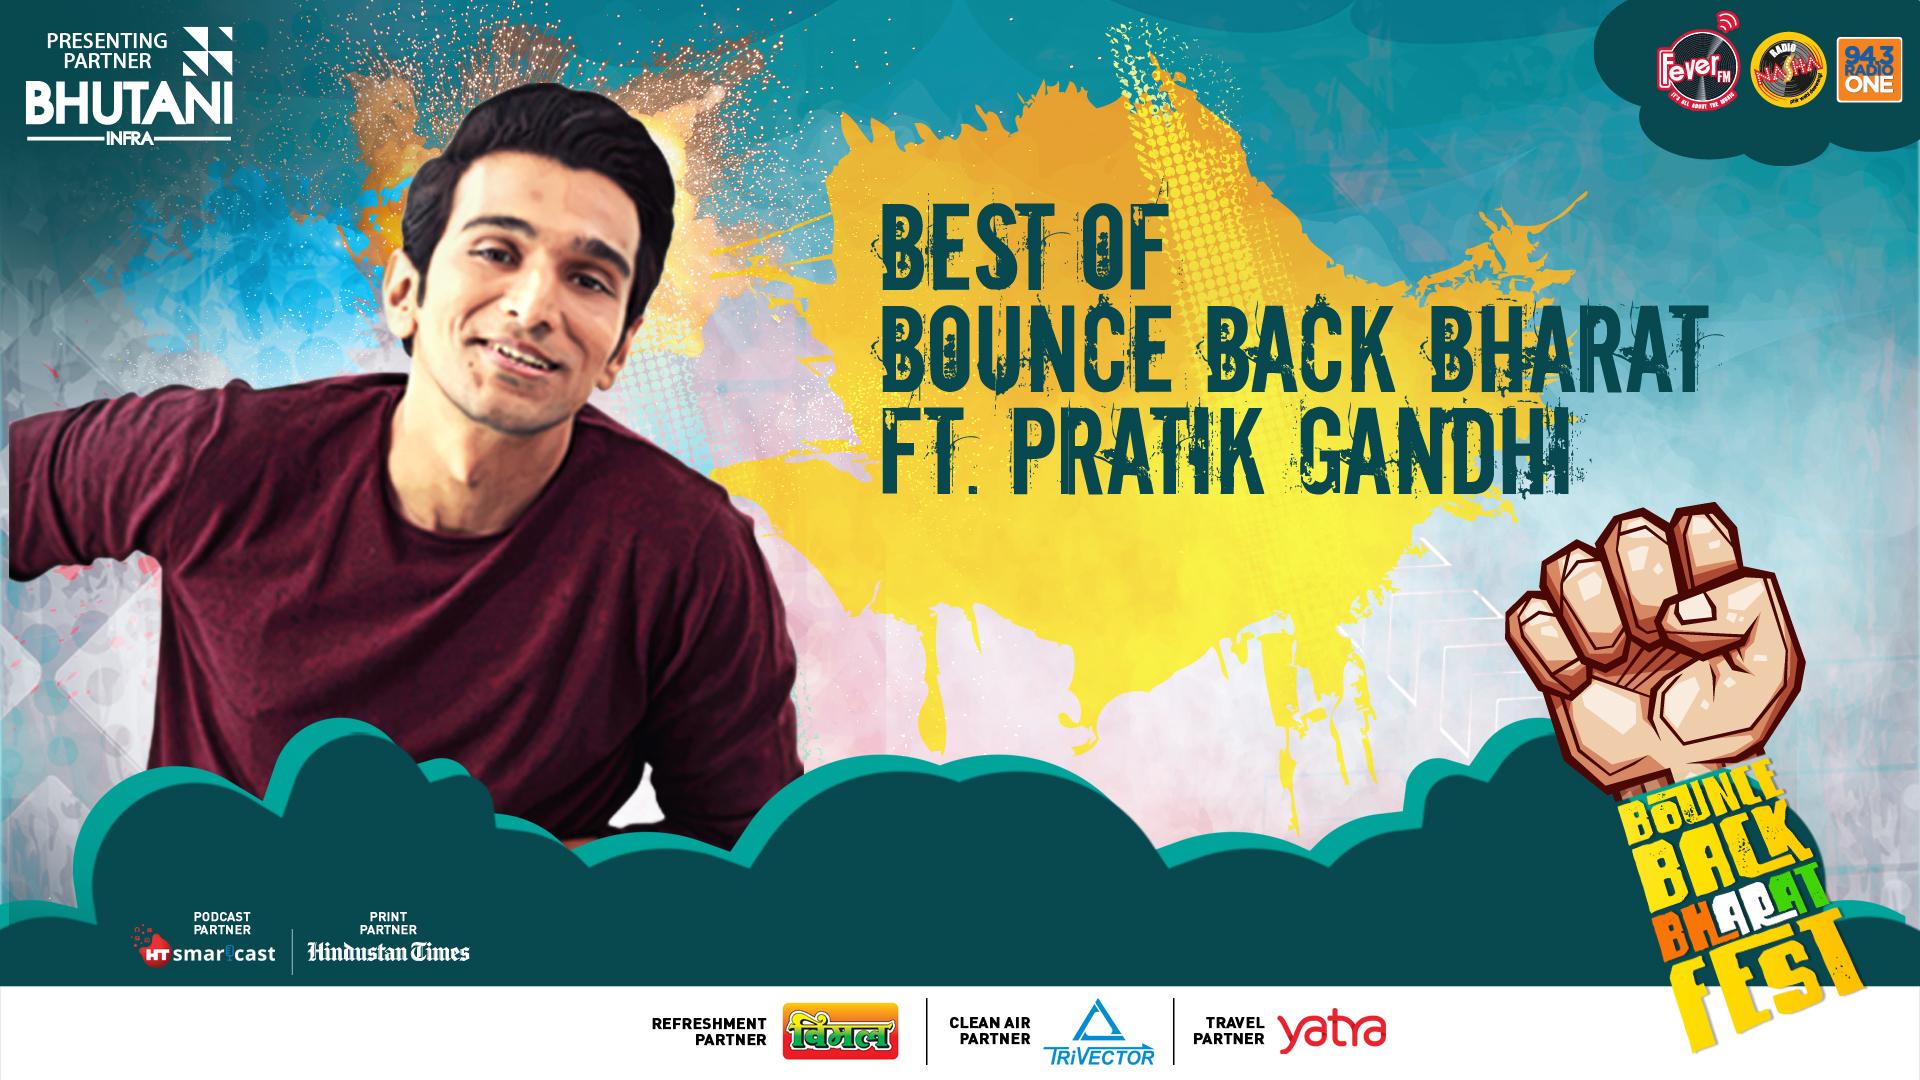 Pratik Gandhi at Bounce Back Bharat